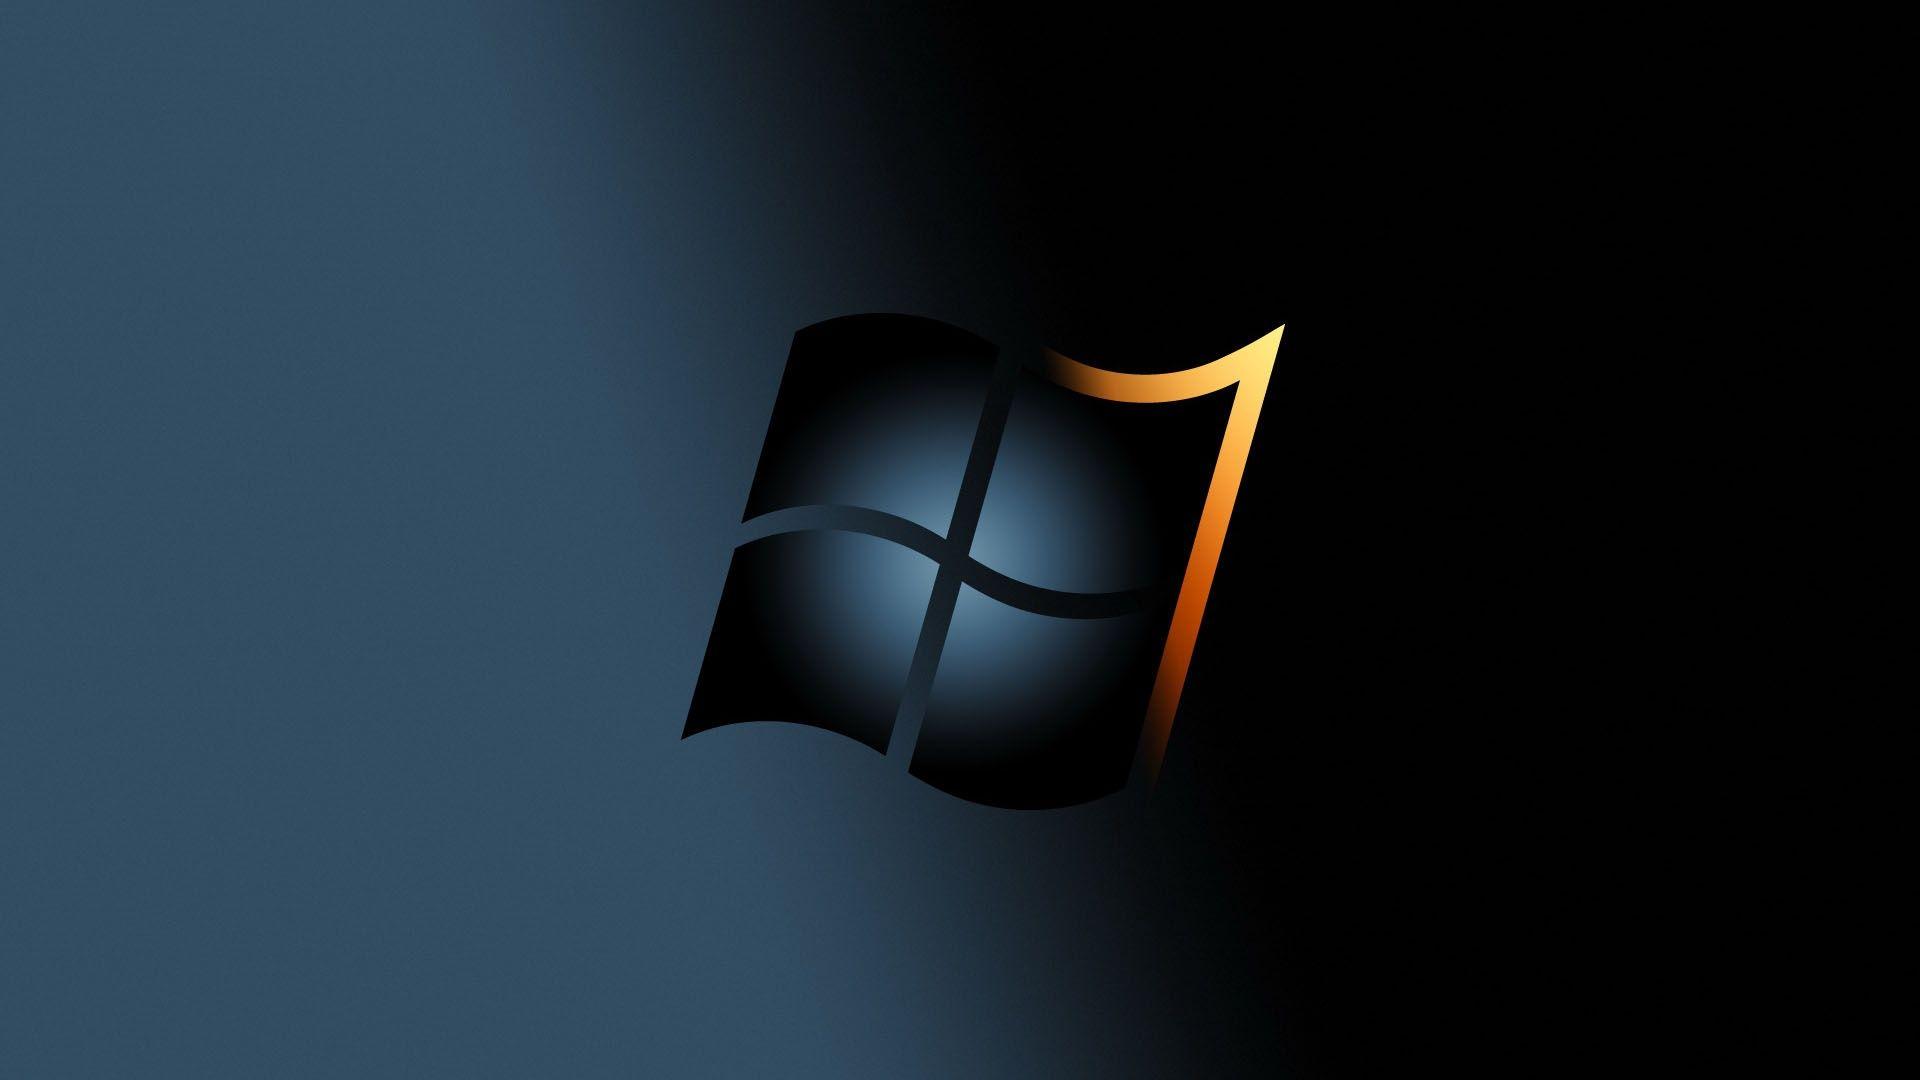 FreeWall-windows-reflective-wallpaper-wpc5805173